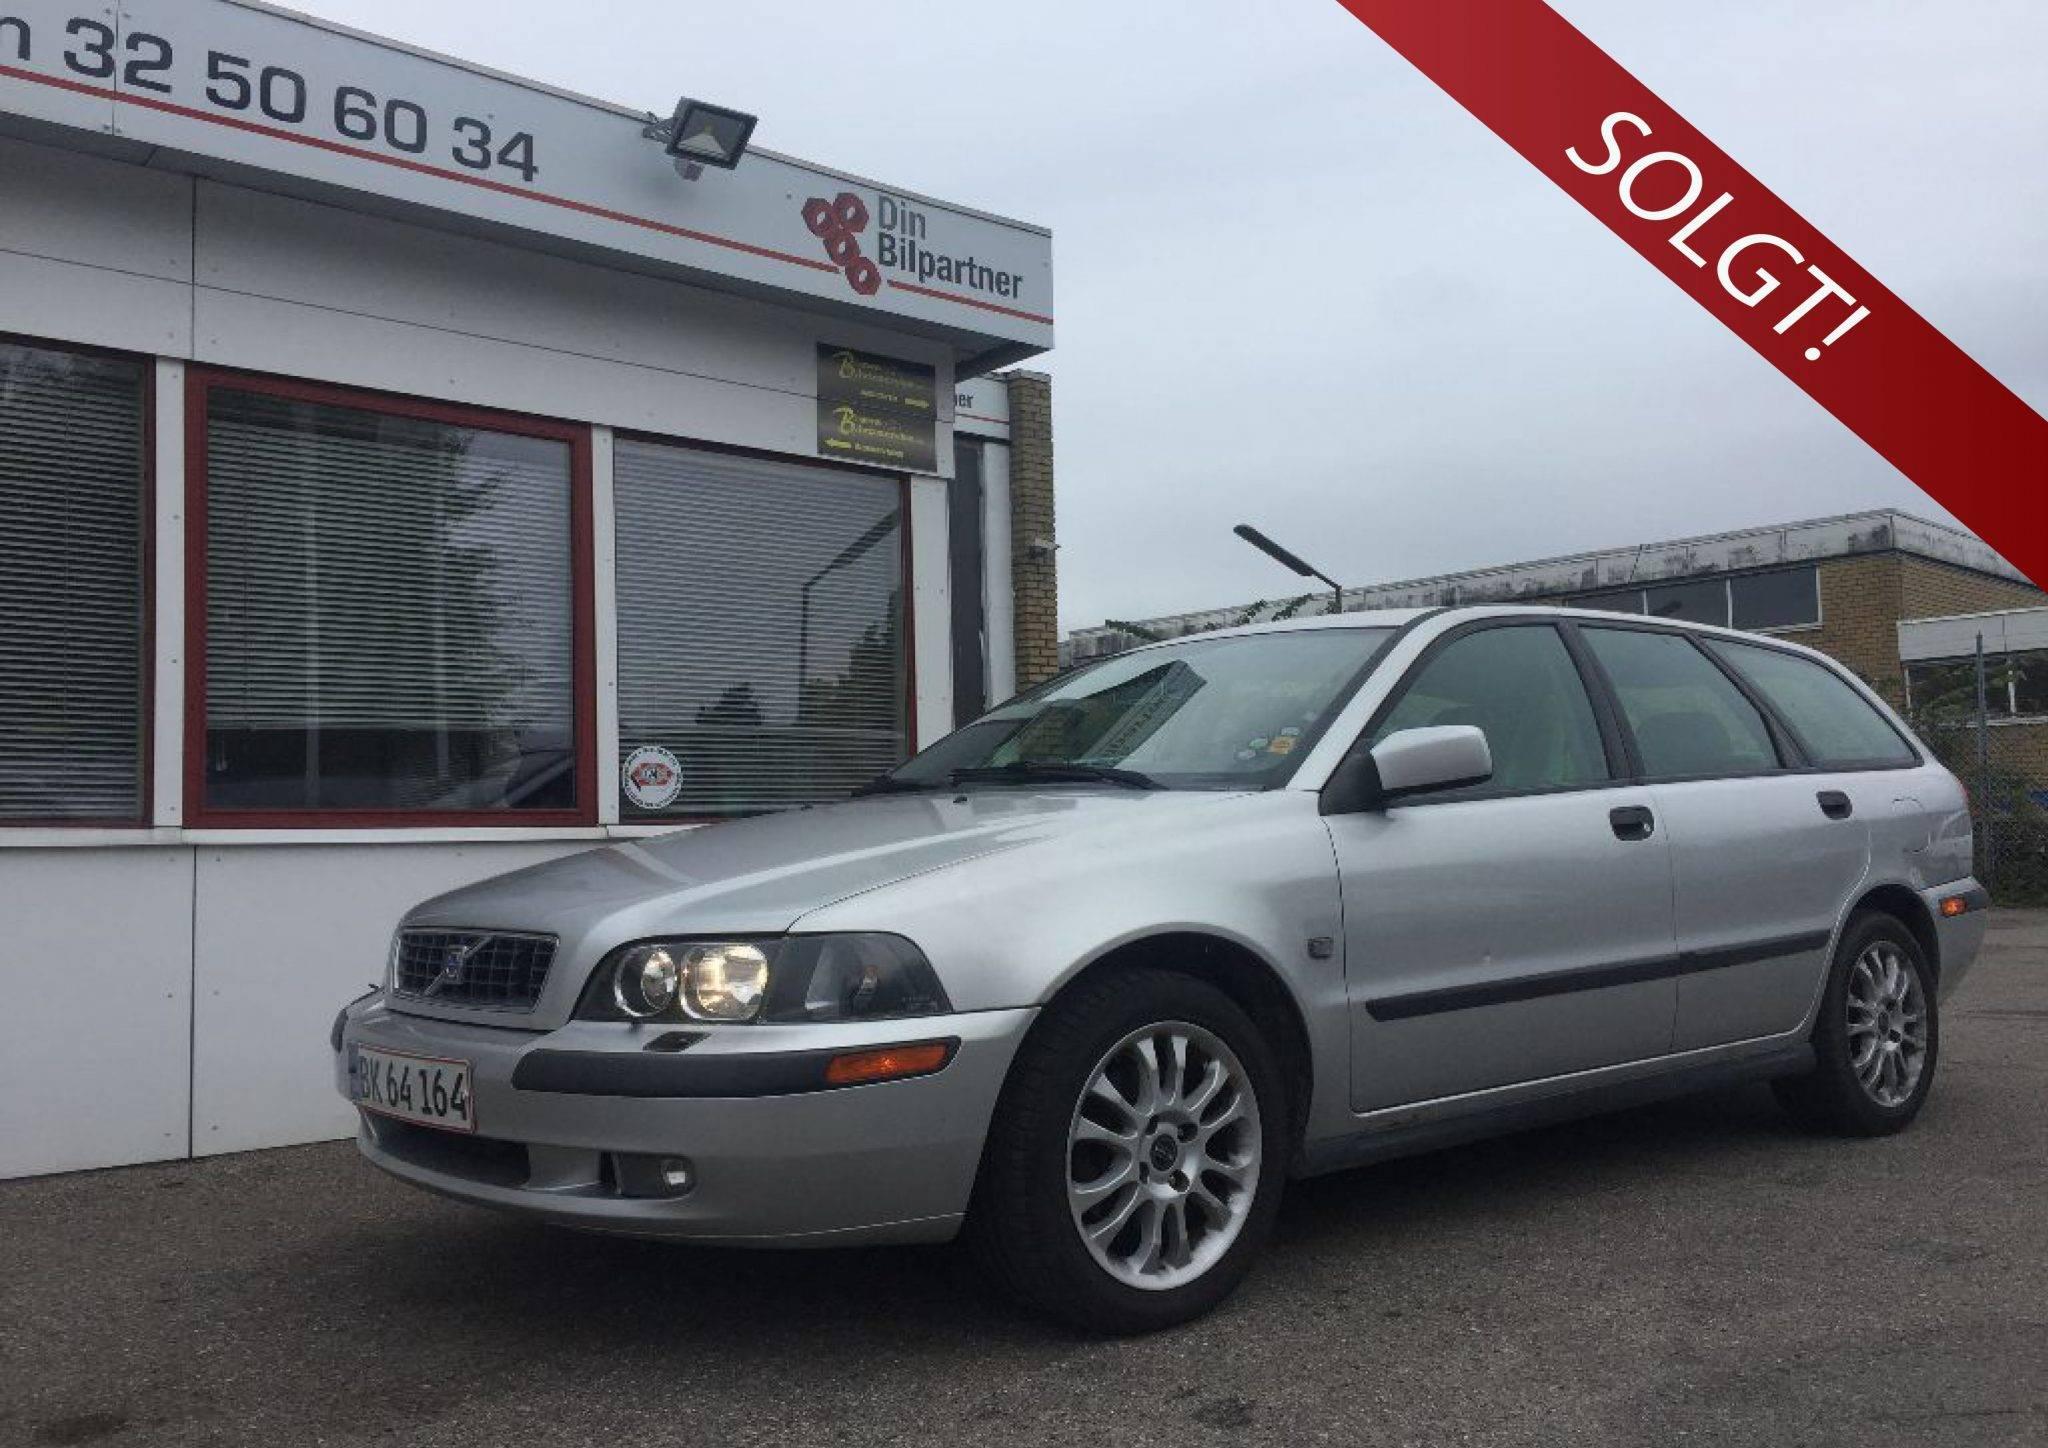 Solgt Volvo - Bilsalg